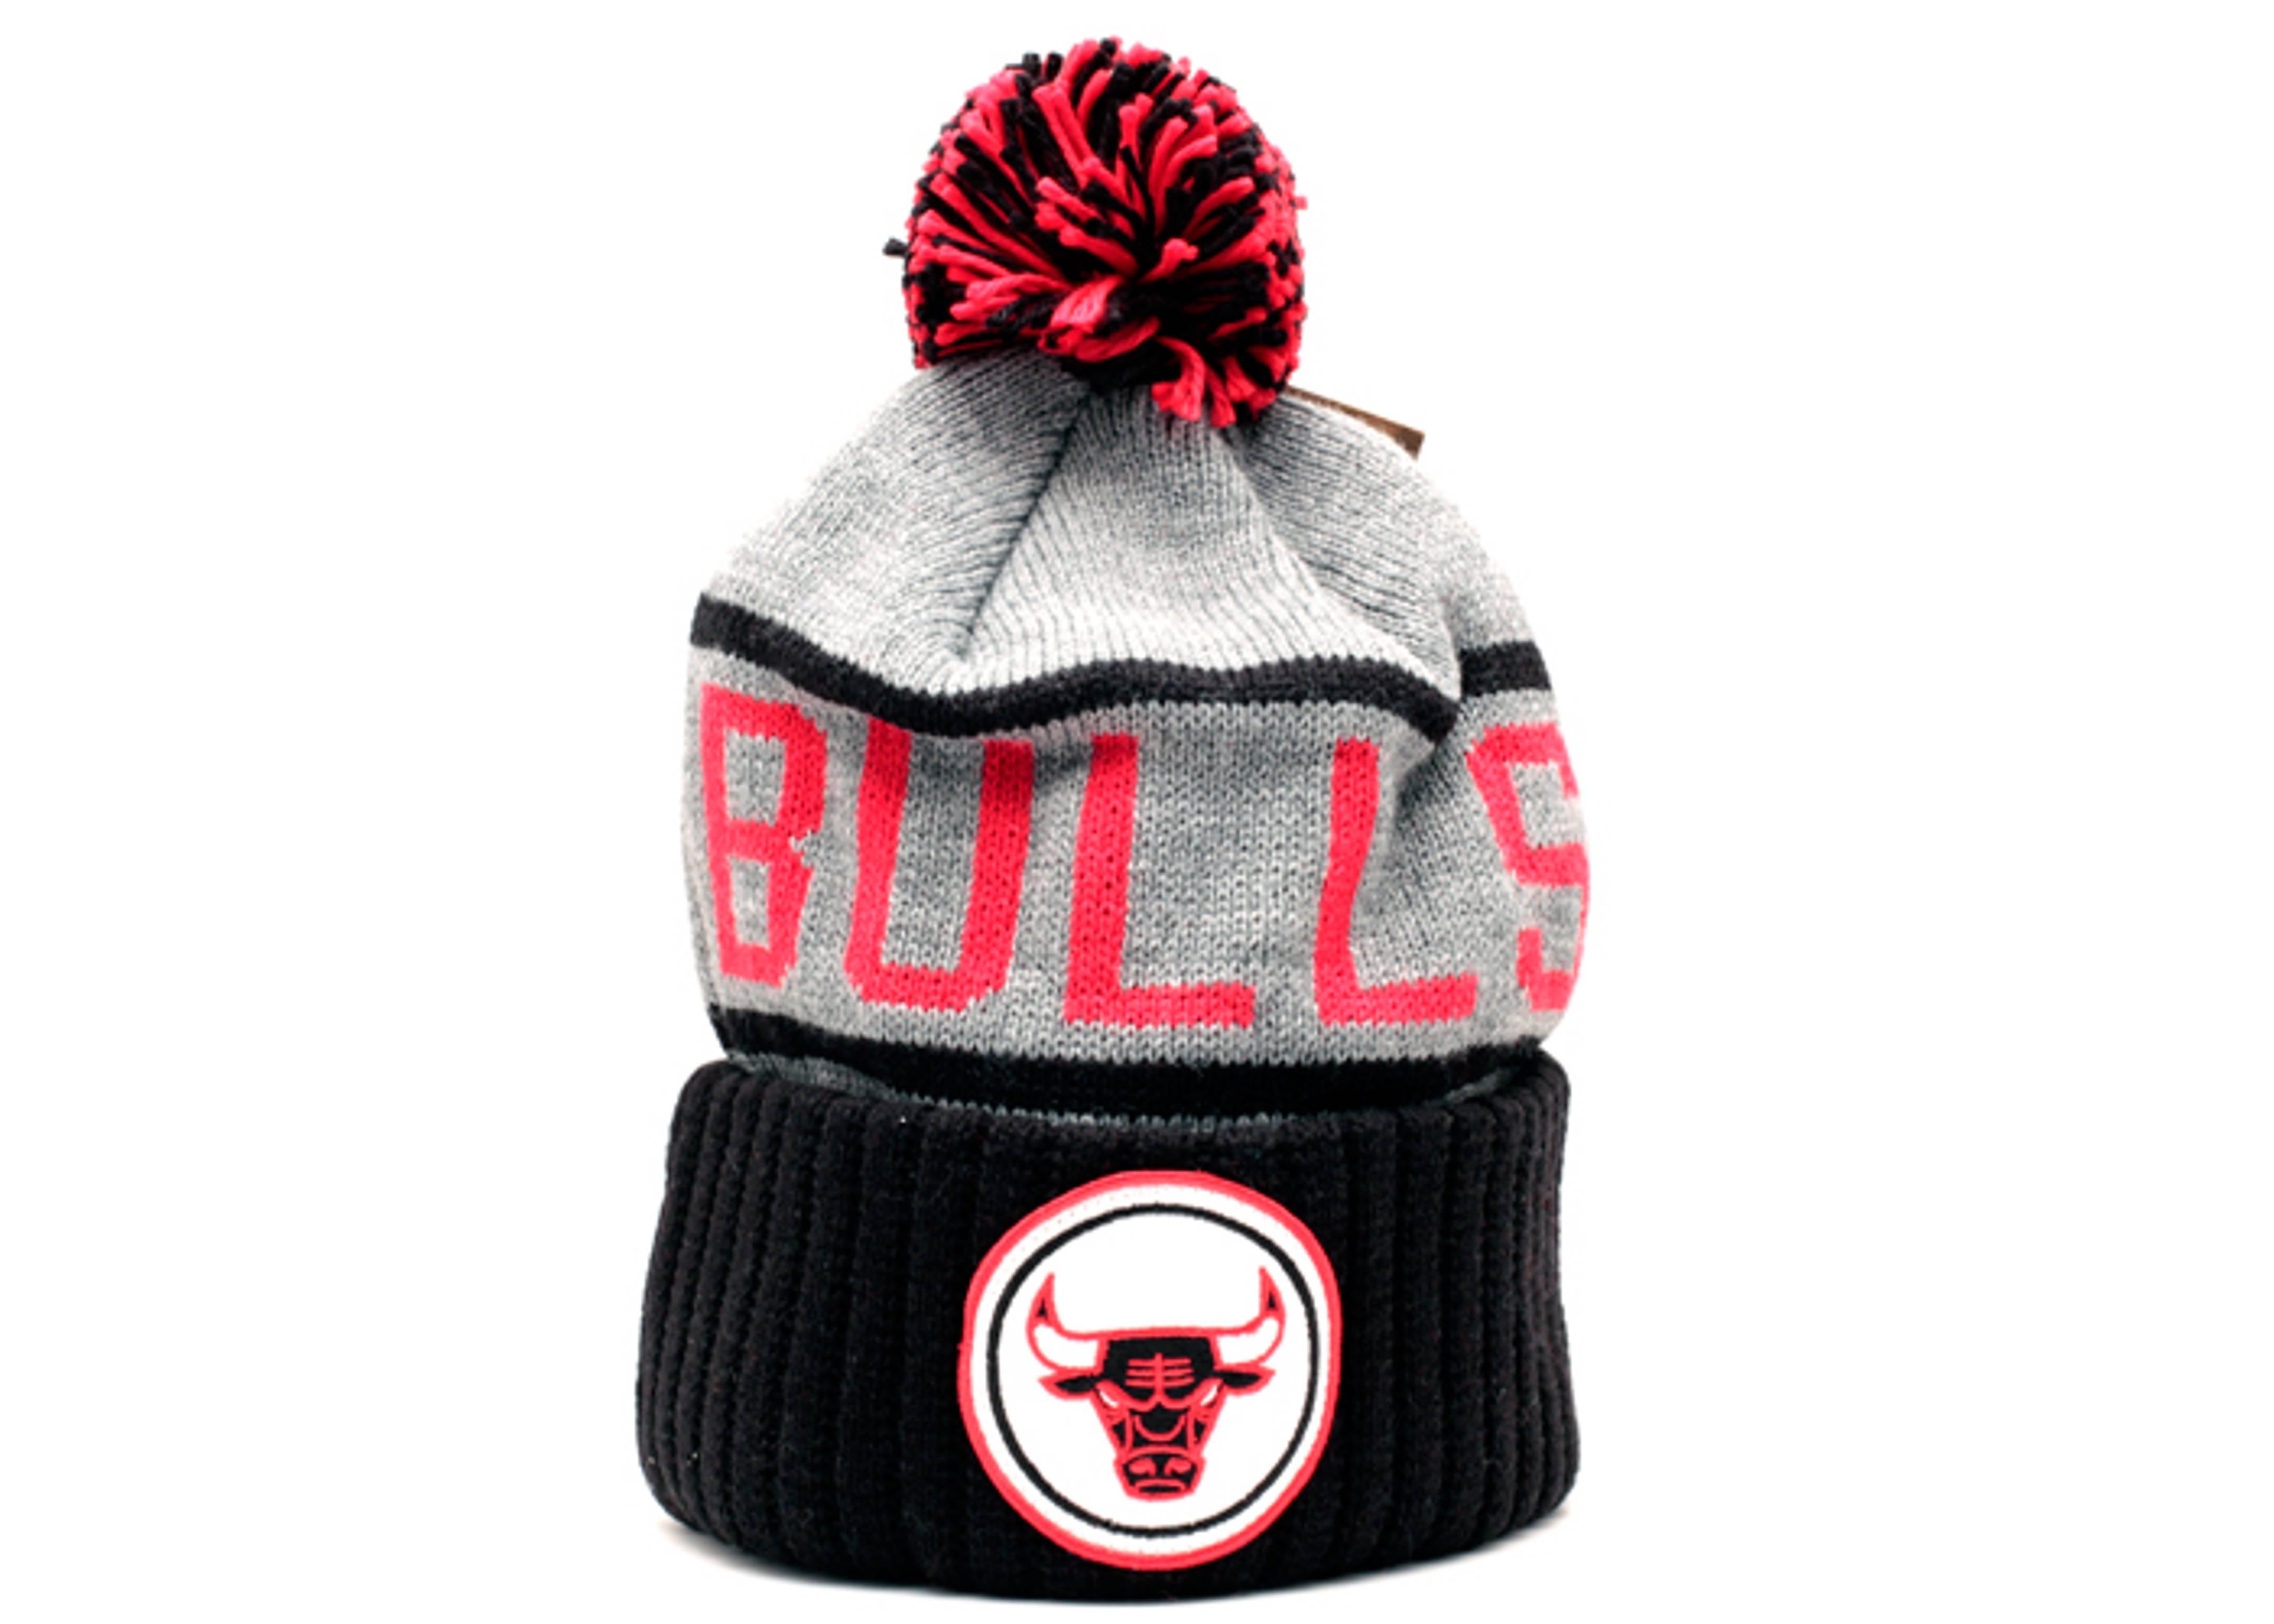 16390c85e903 Chicago Bulls Cuffed Pom Knit Beanie - Mitchell   Ness ...